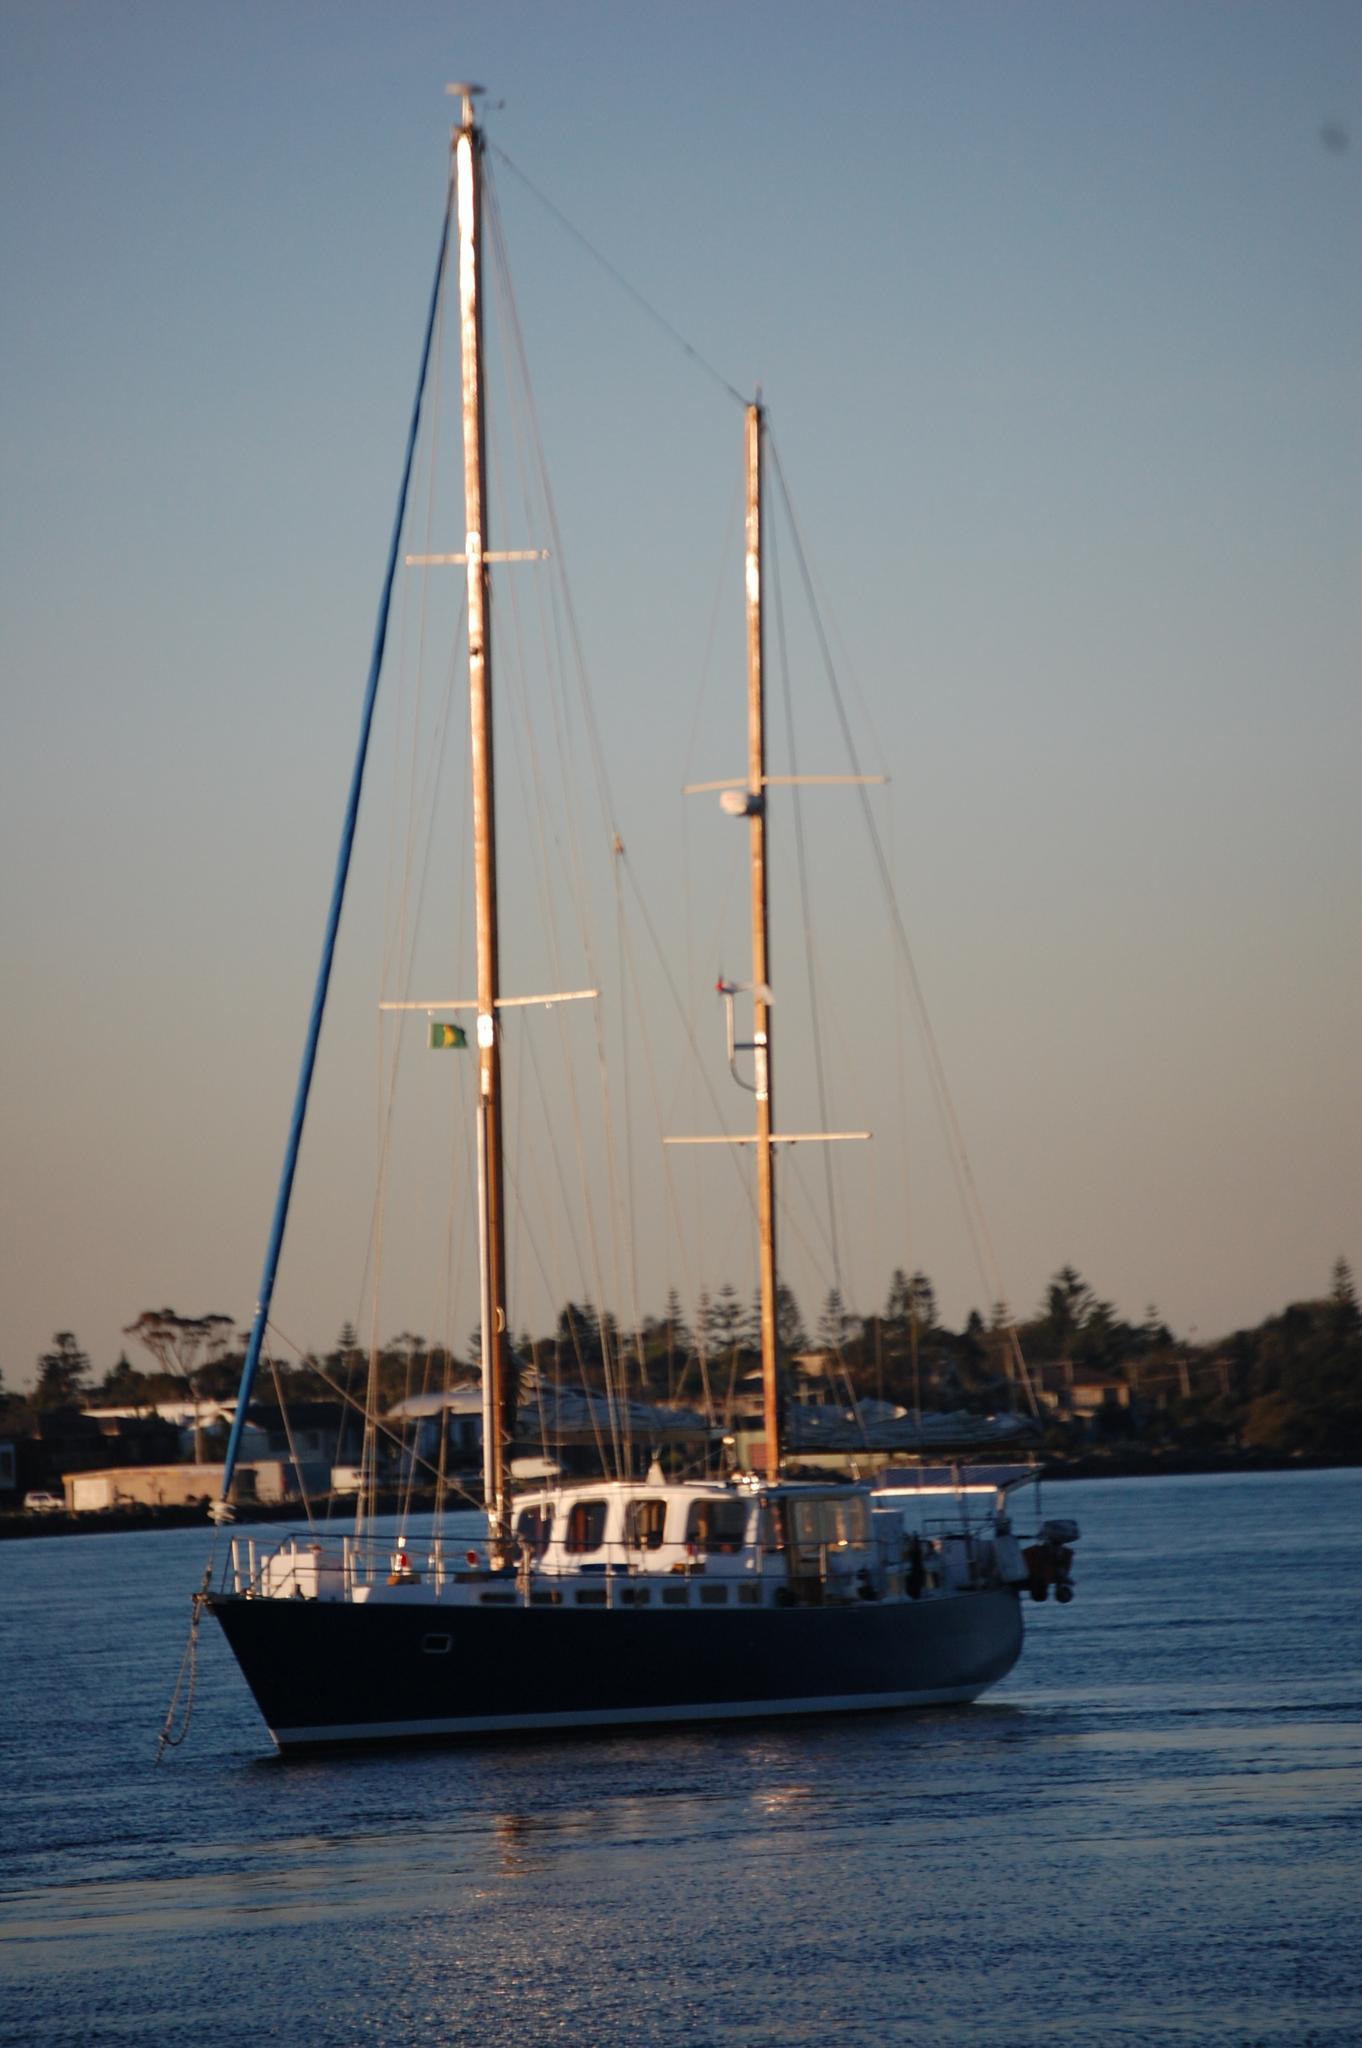 Hewllo Sail-less by John Titmus